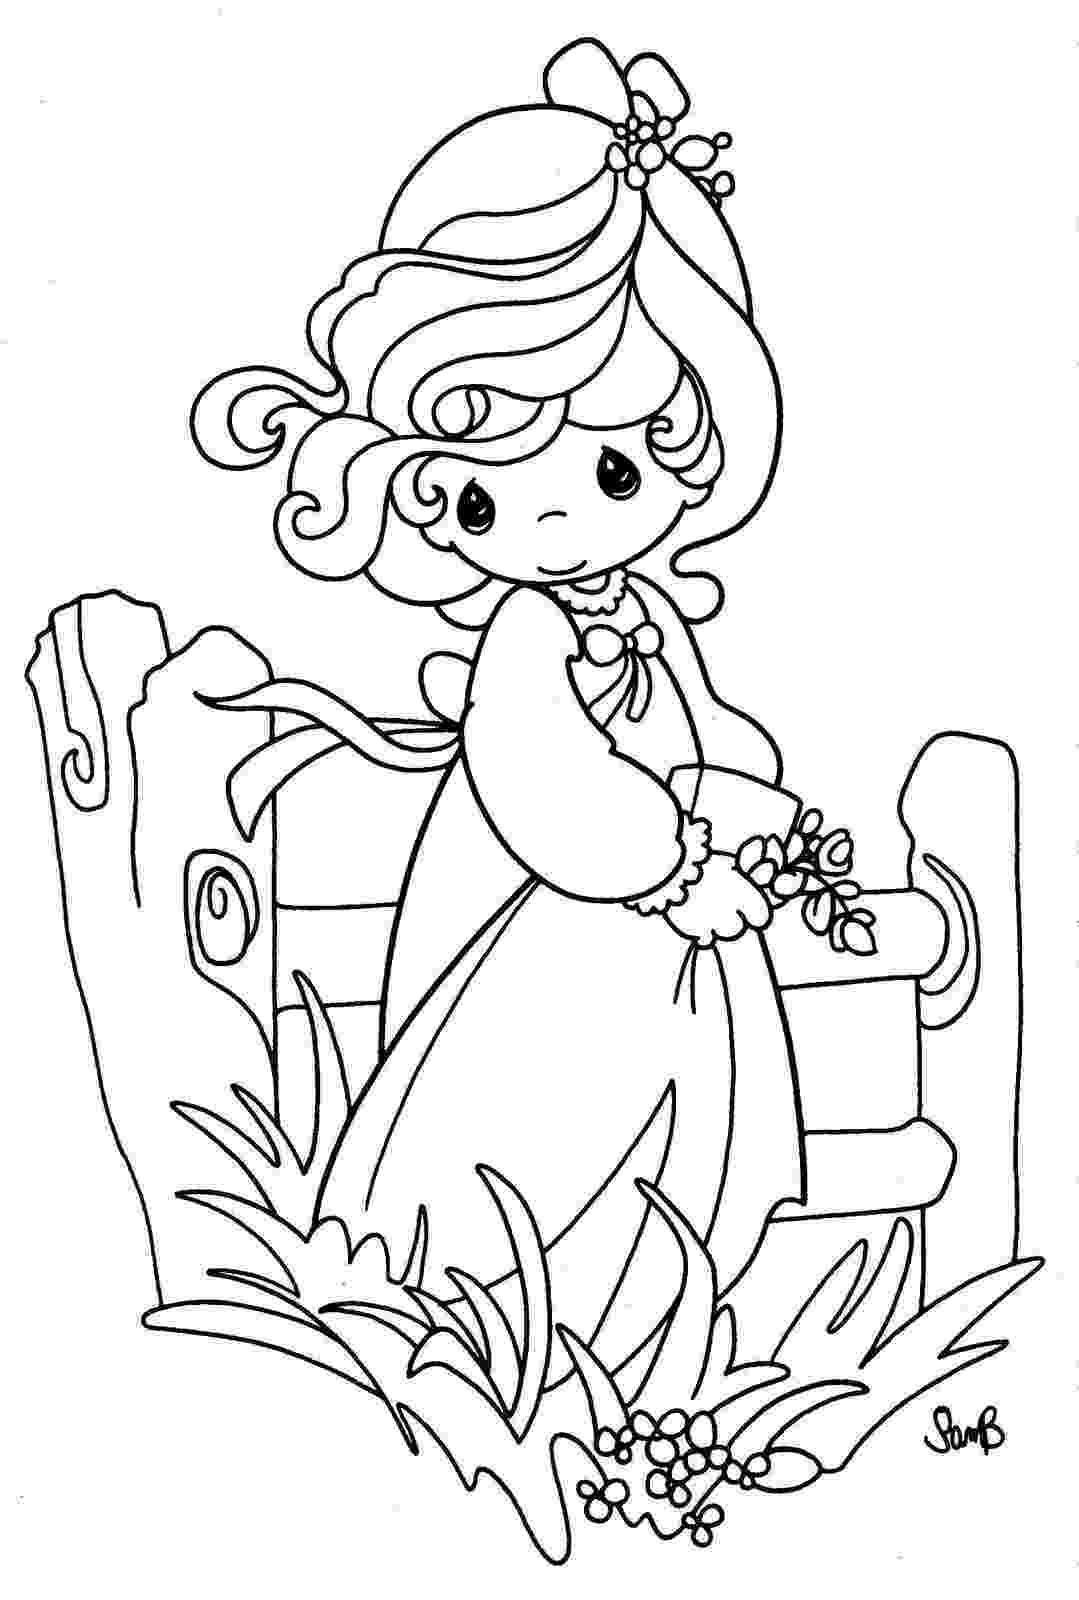 precious moments coloring pages precious moments coloring pages fantasy coloring pages coloring precious moments pages